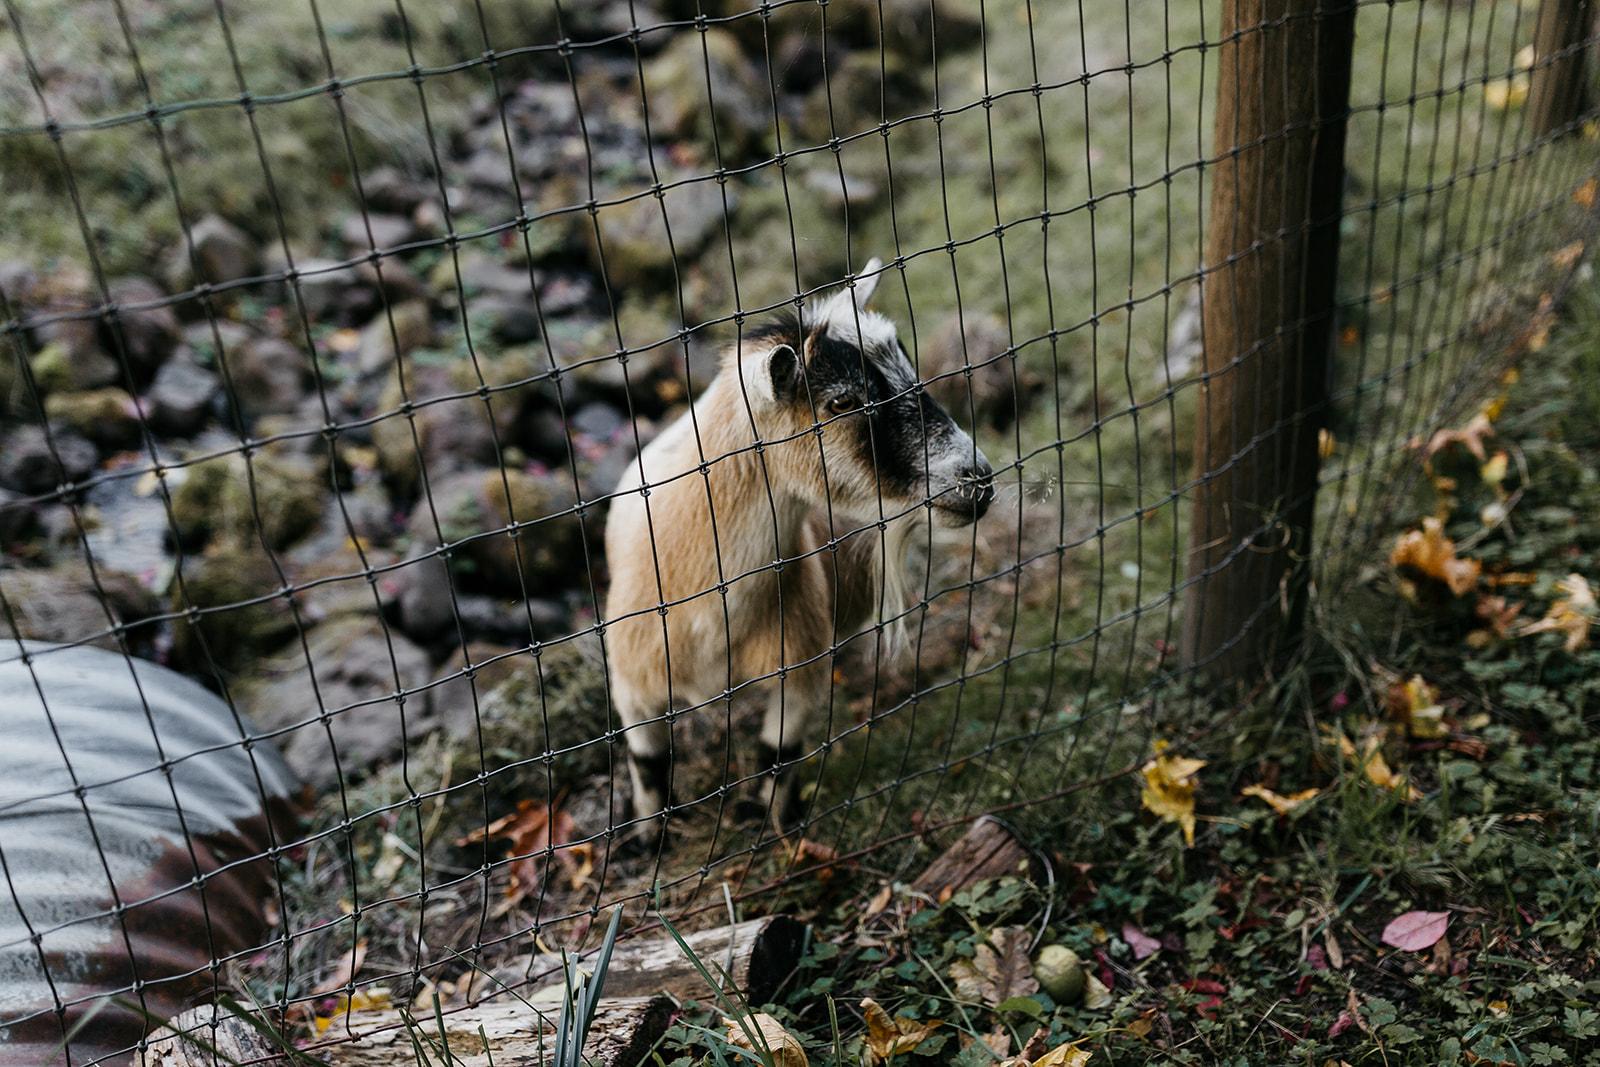 Limpy the goat.  Photo by Alyssa Elliott.